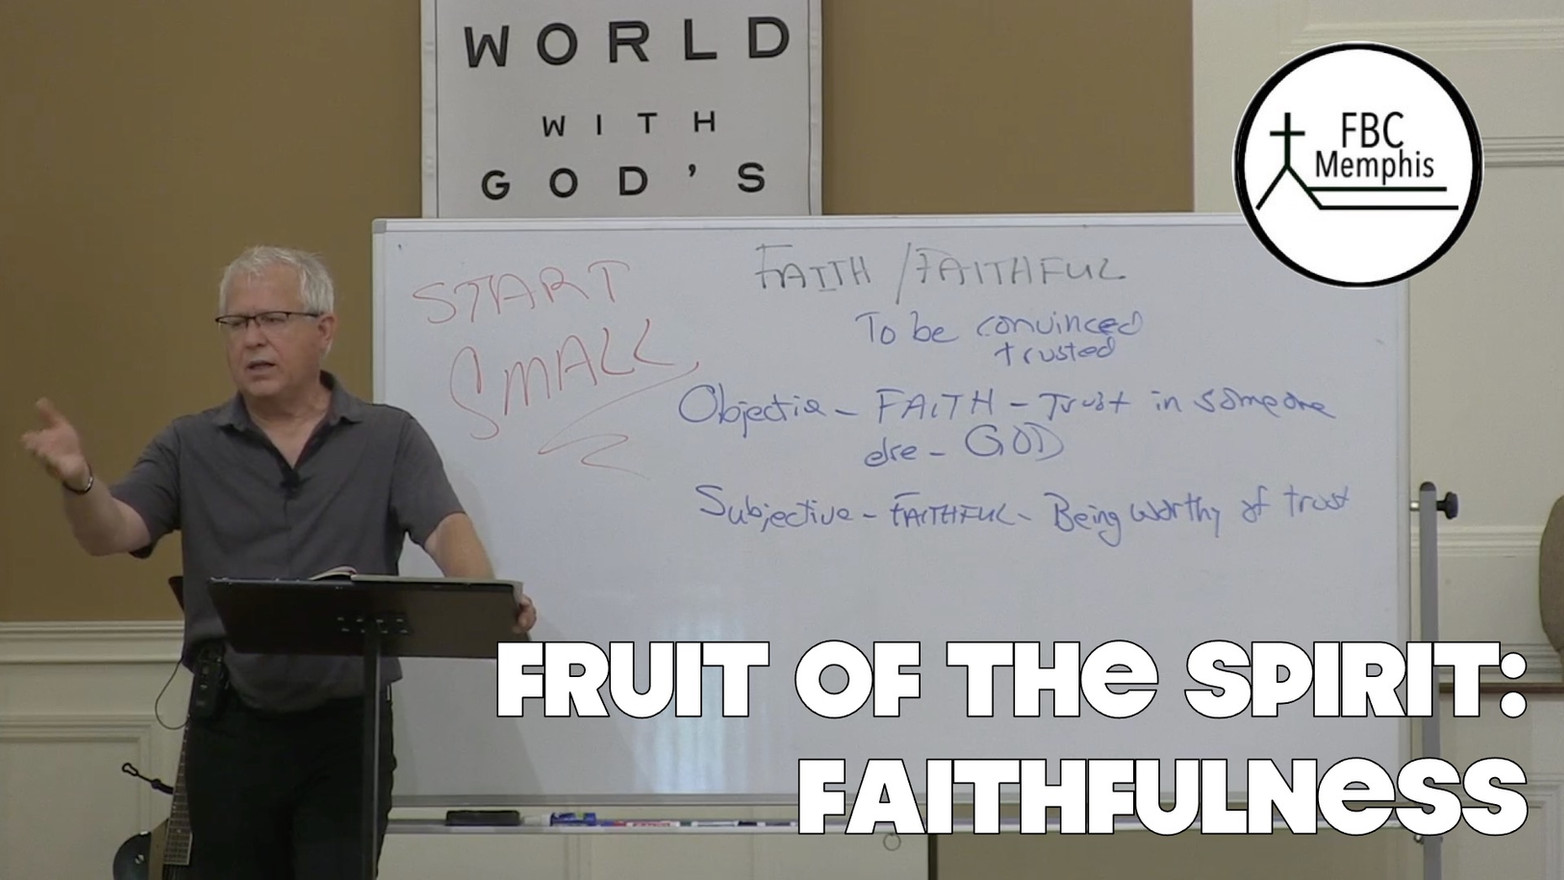 Wednesday Devotional: Fruit of The Spirit (Faithfulness)